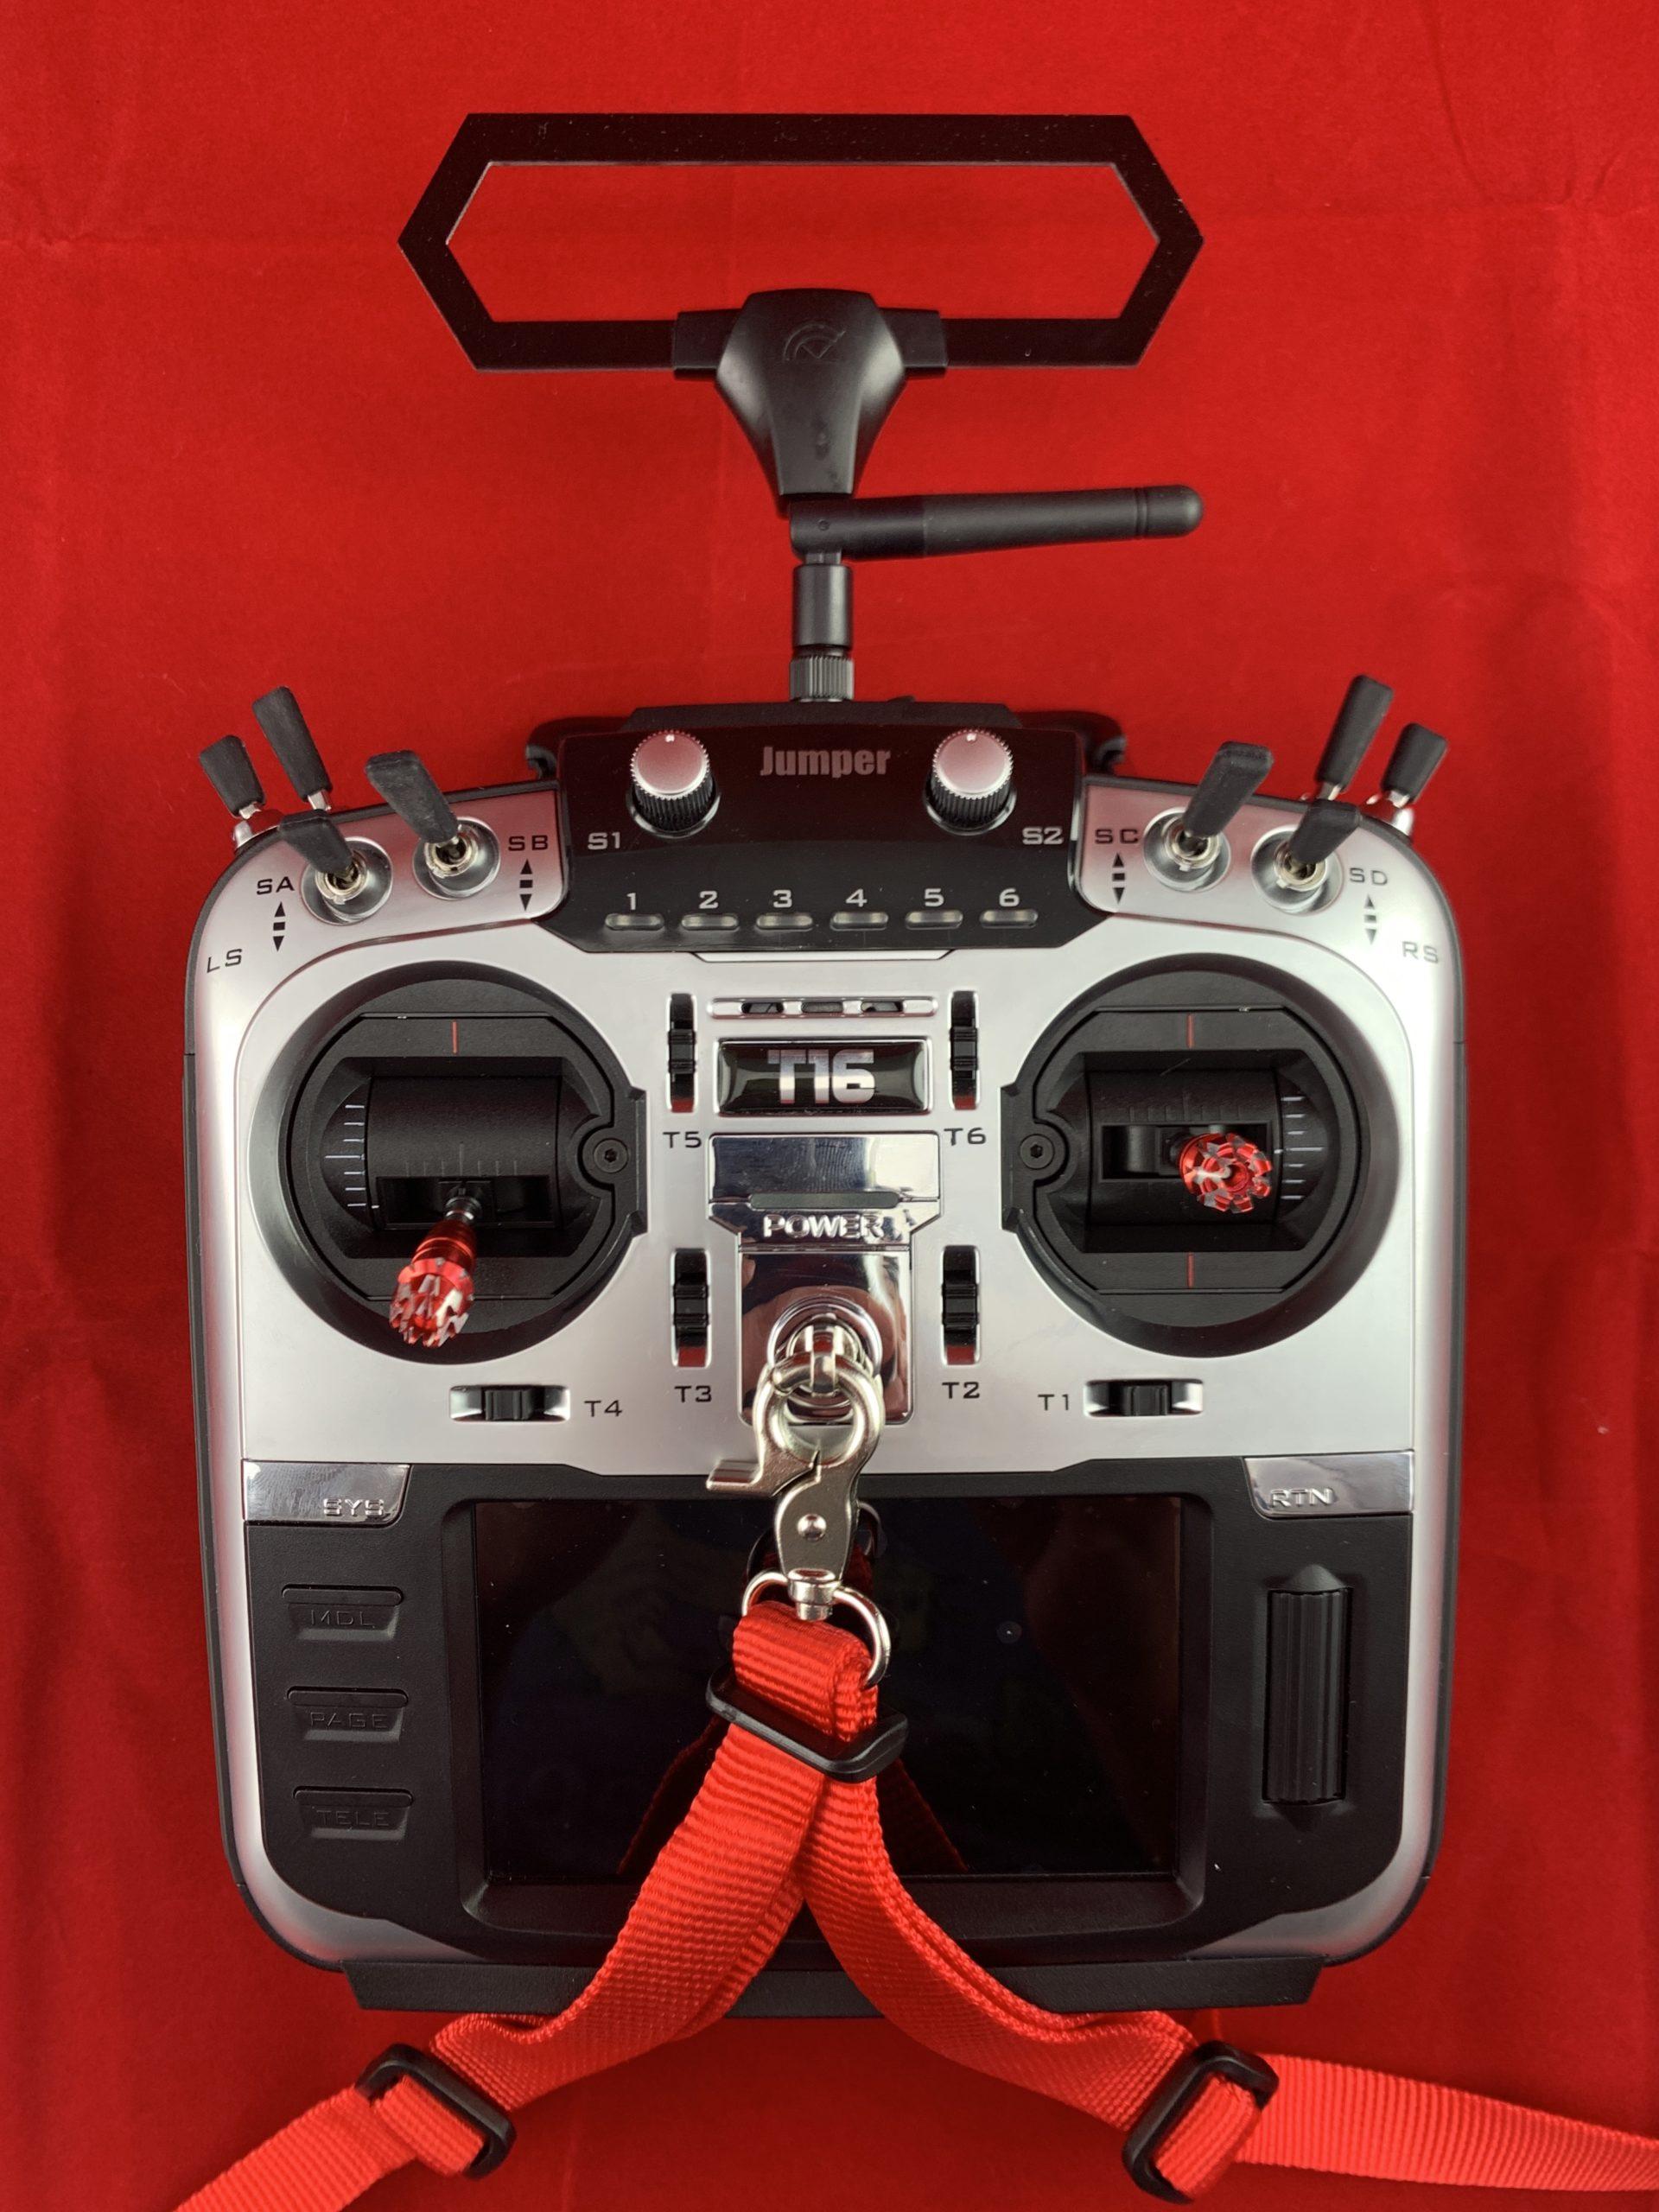 Jumper T16 Pro Multi-Protocol Radio w/Hall Sensor Gimbals